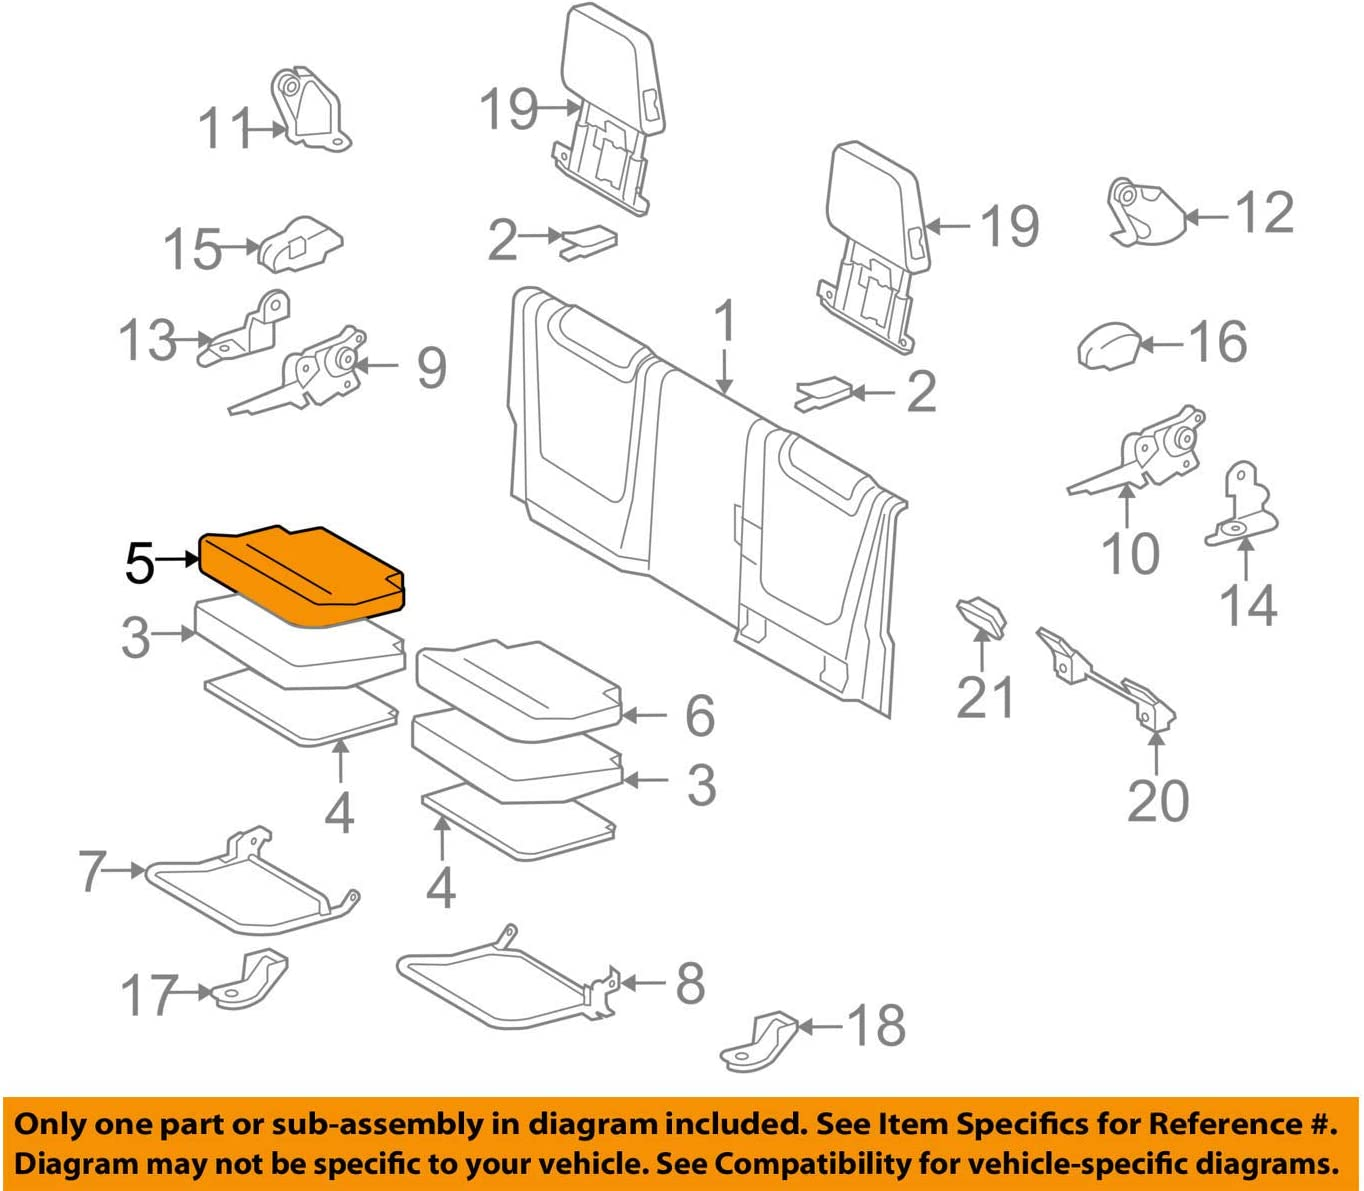 SEAL limited San Antonio Mall product TOYOTA Genuine 71075-04200-B1 Seat Cover Cushion